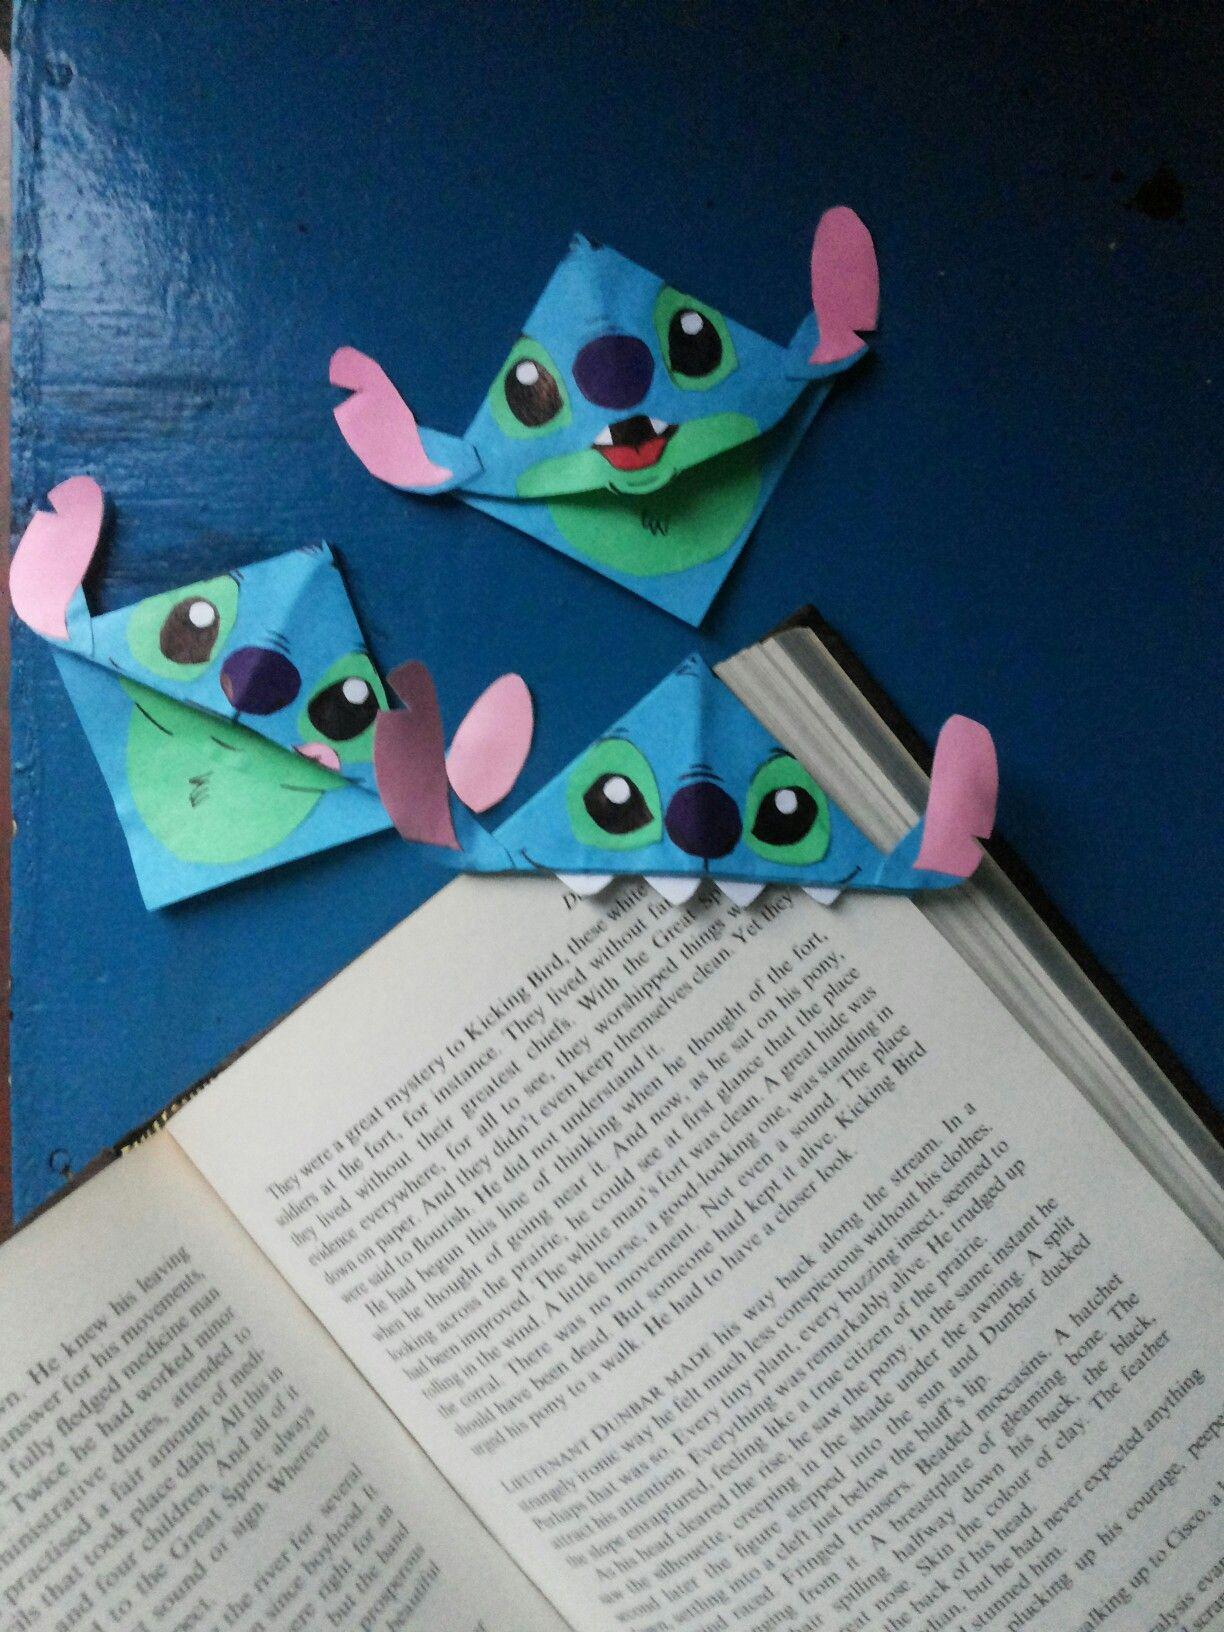 3 Easy Diy Storage Ideas For Small Kitchen: DIY Stitch Corner Bookmarks